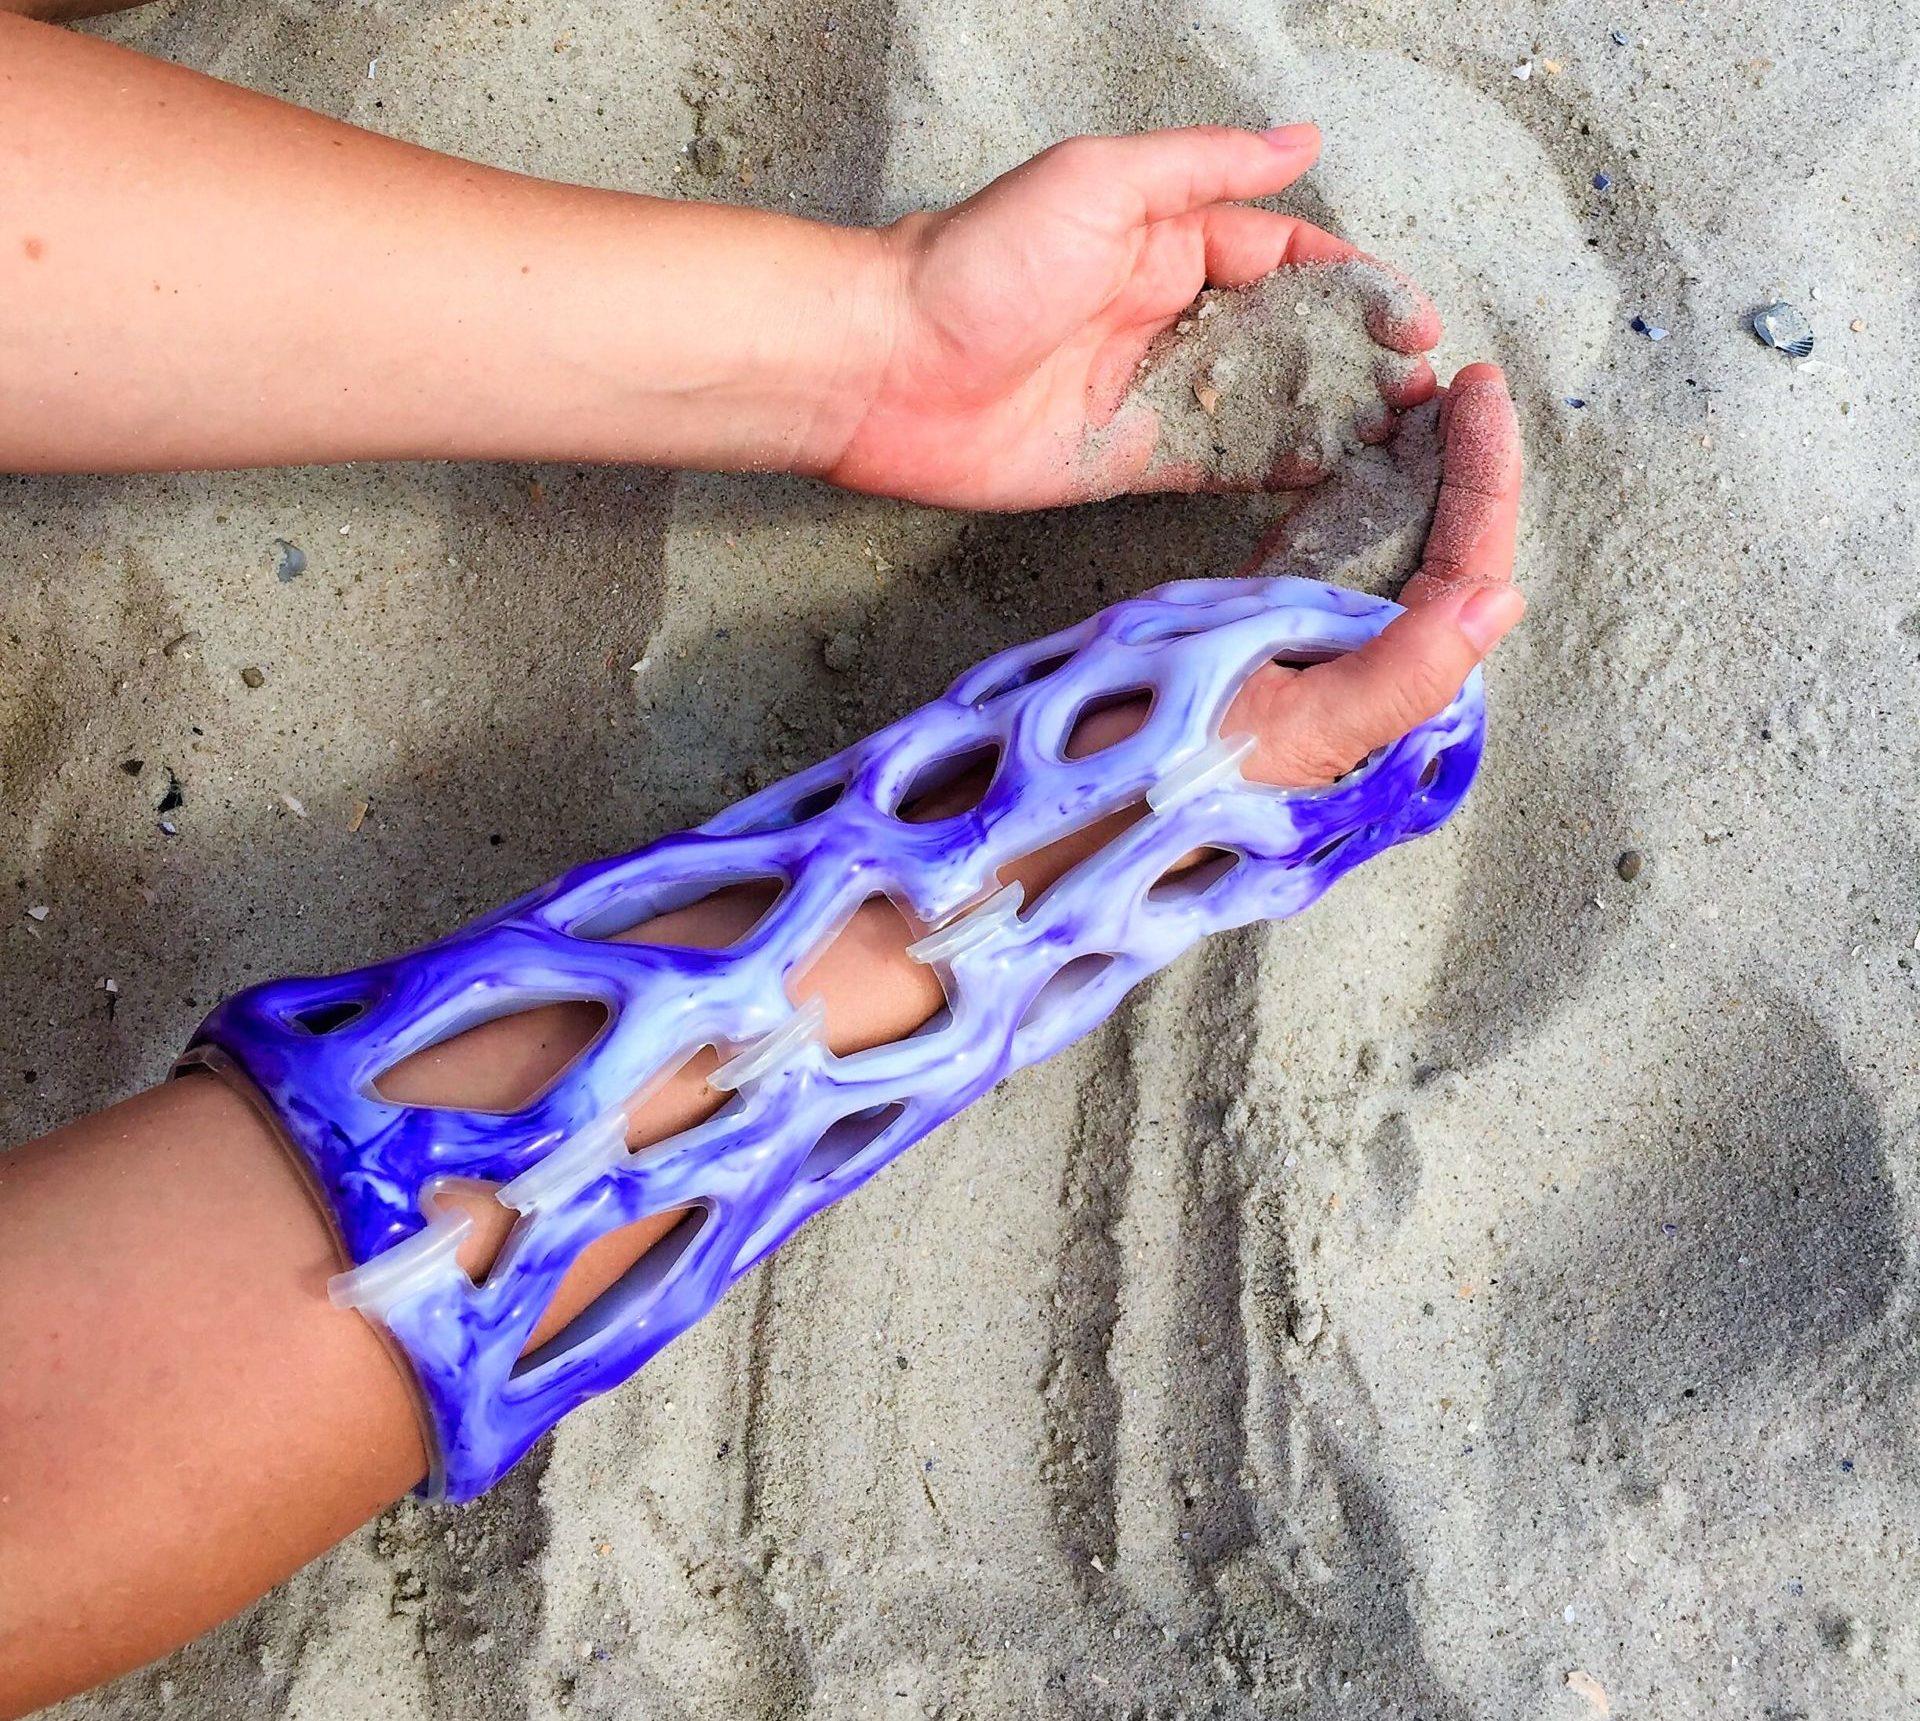 Futuristic cast is bath- and ocean-friendly